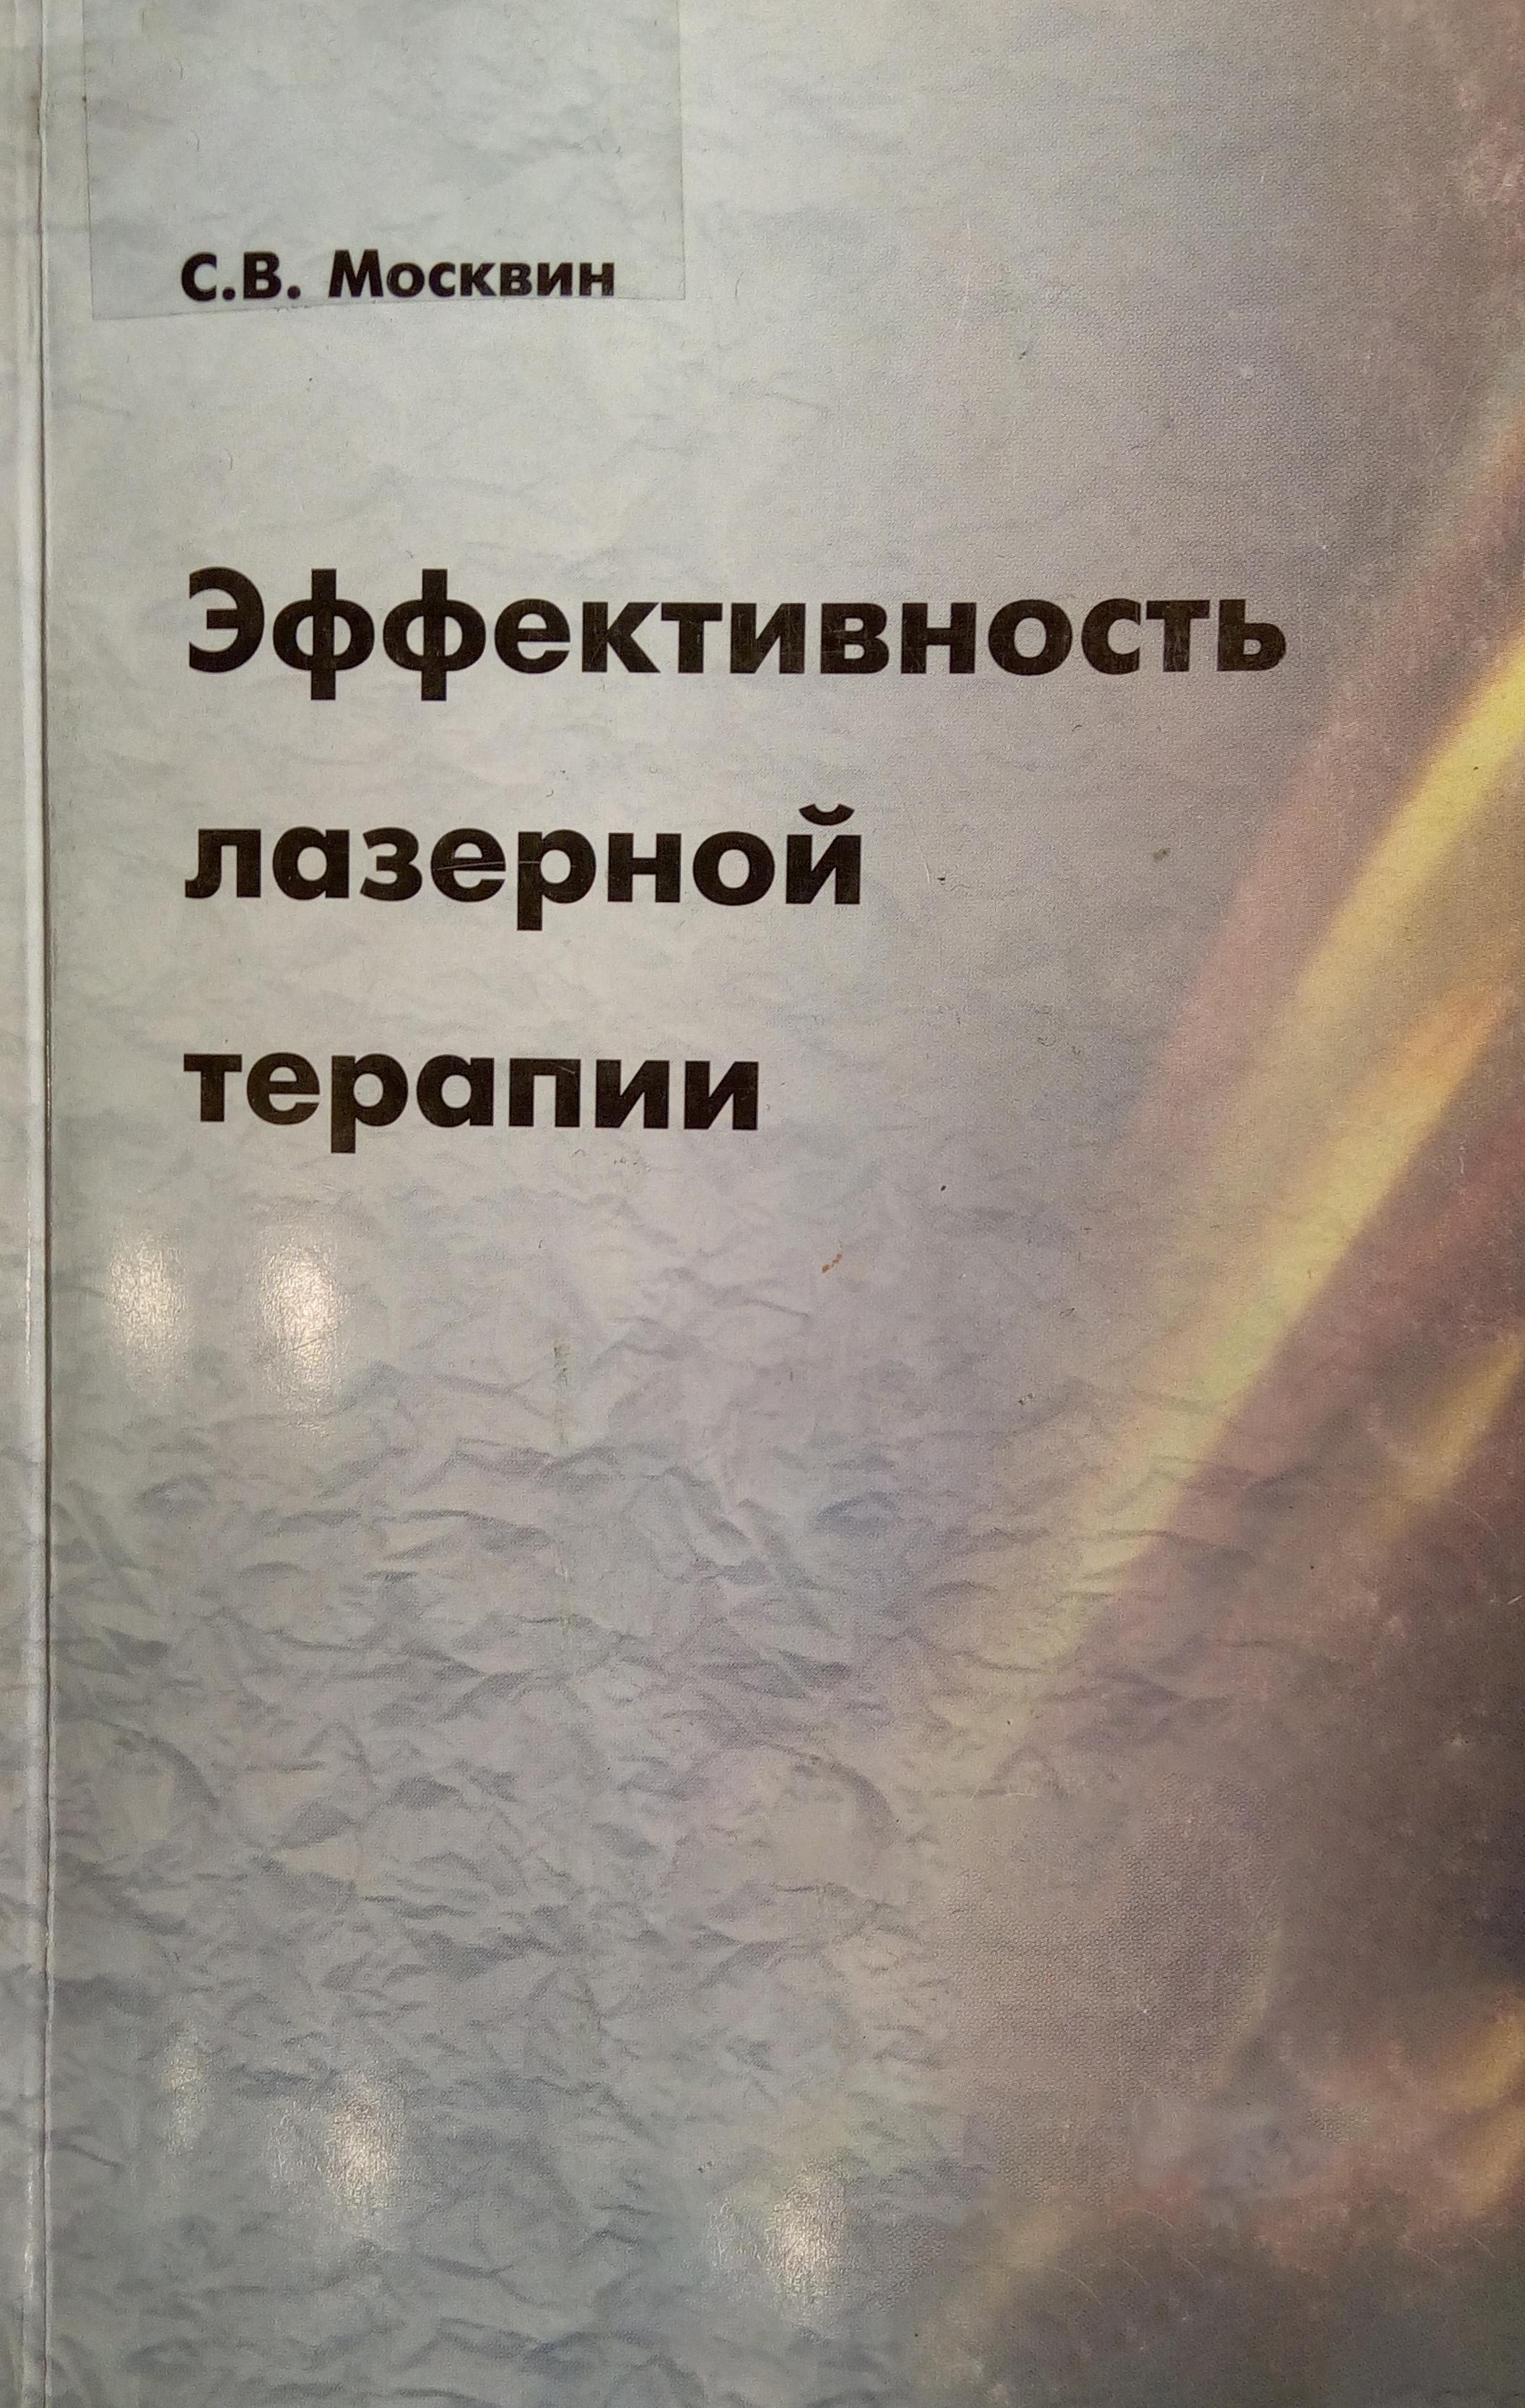 http://sd.uploads.ru/dMRpc.jpg